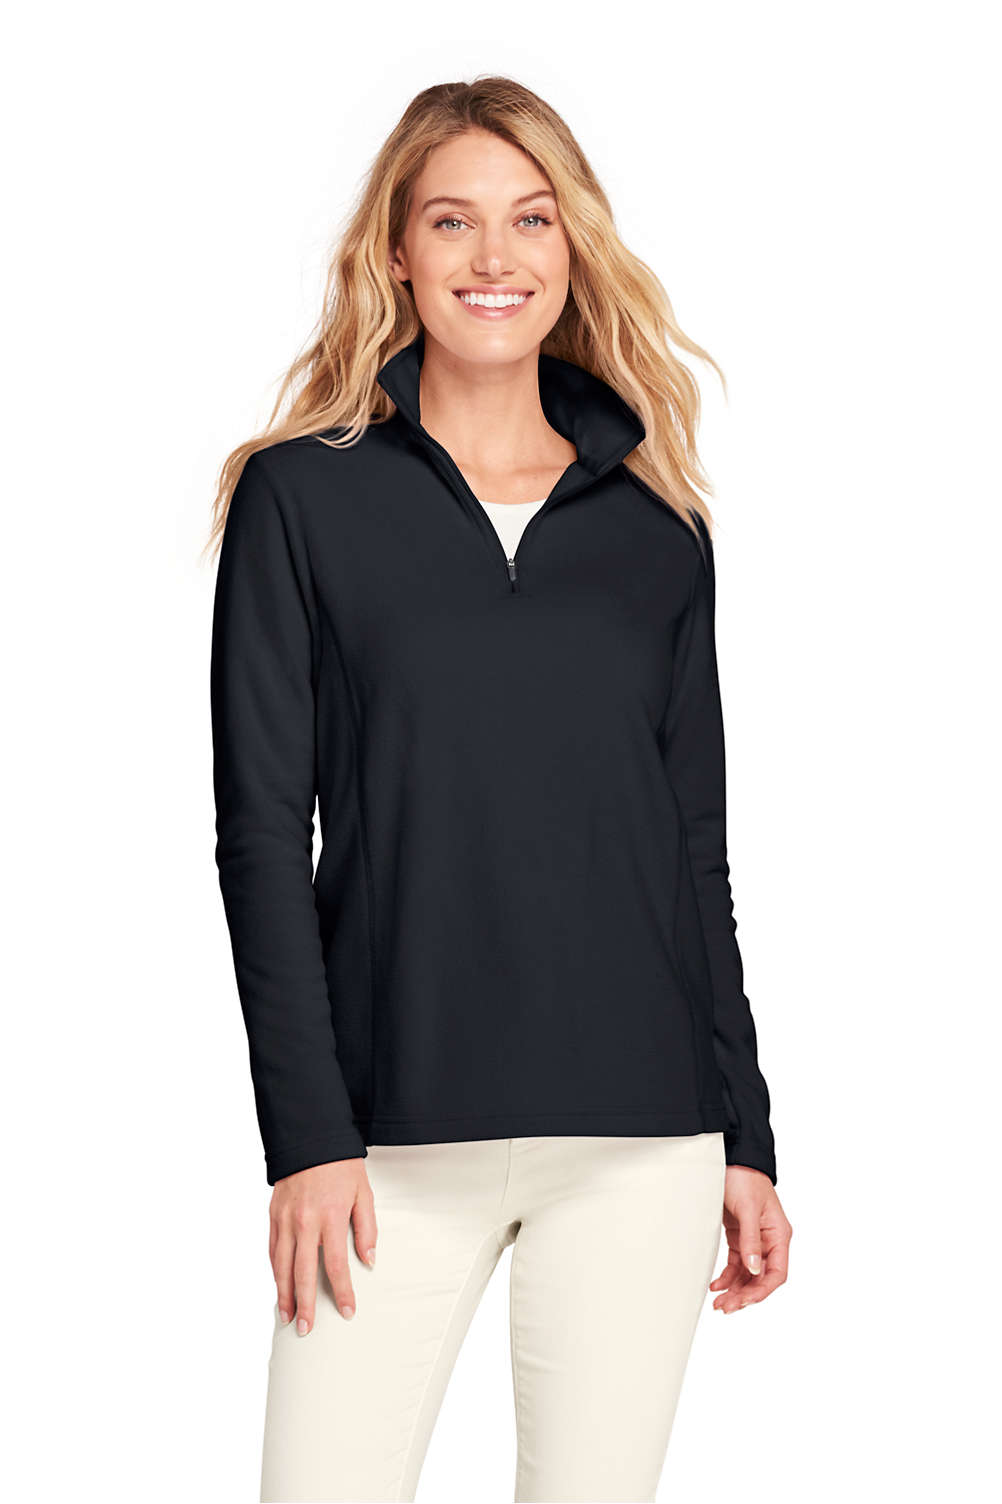 f46f4ea3d02 Women's Quarter Zip Fleece Pullover from Lands' End